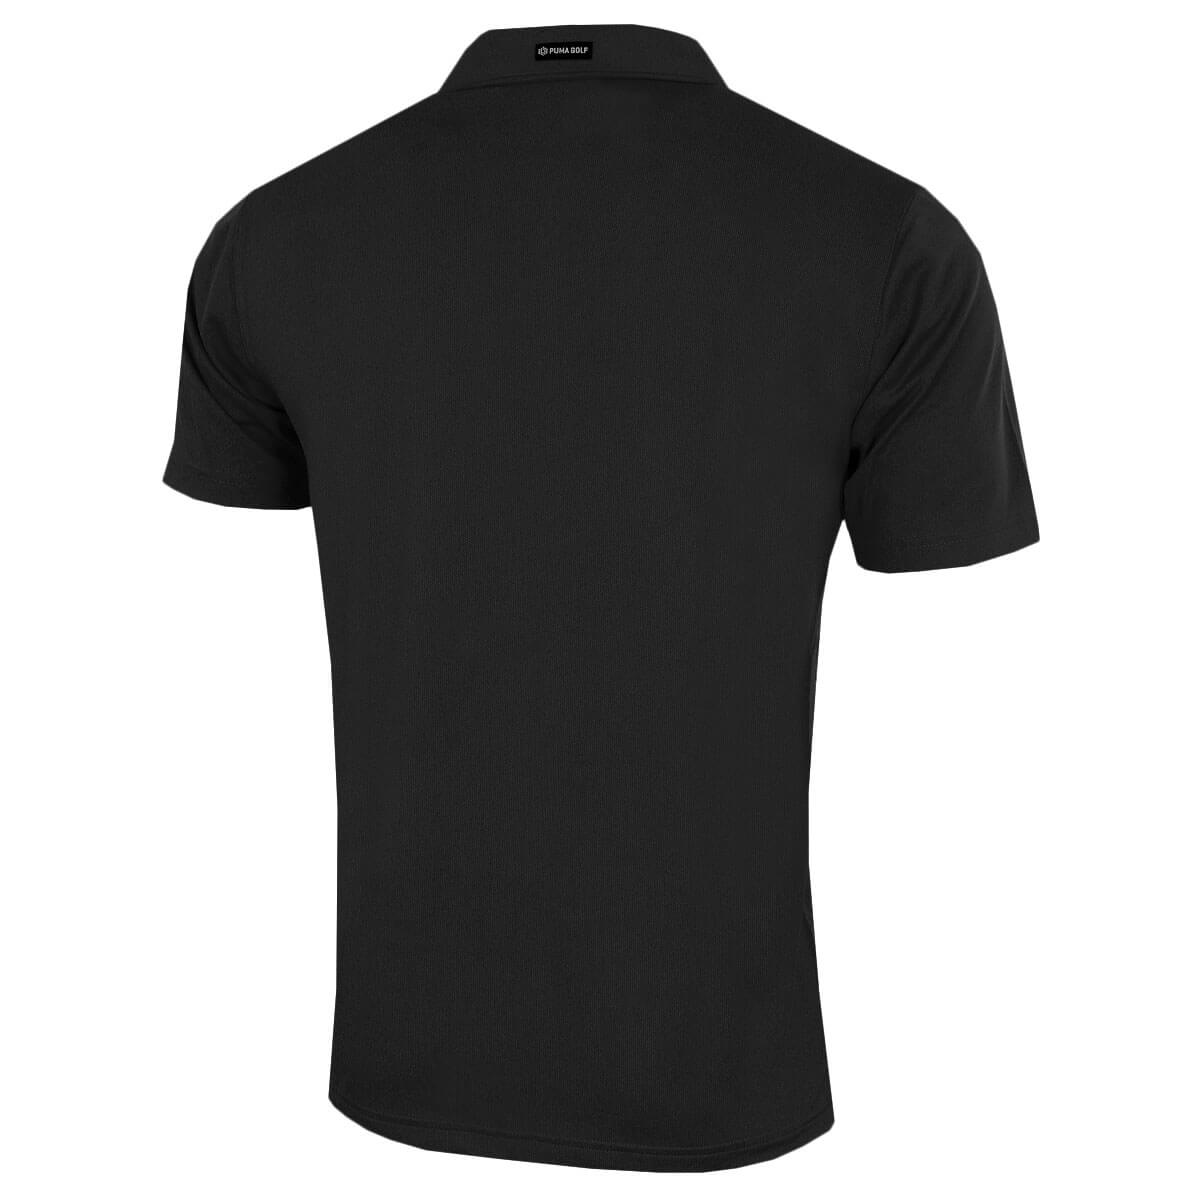 Puma-Golf-Mens-Essential-Pounce-Cresting-DryCell-Tech-Polo-Shirt-46-OFF-RRP thumbnail 3